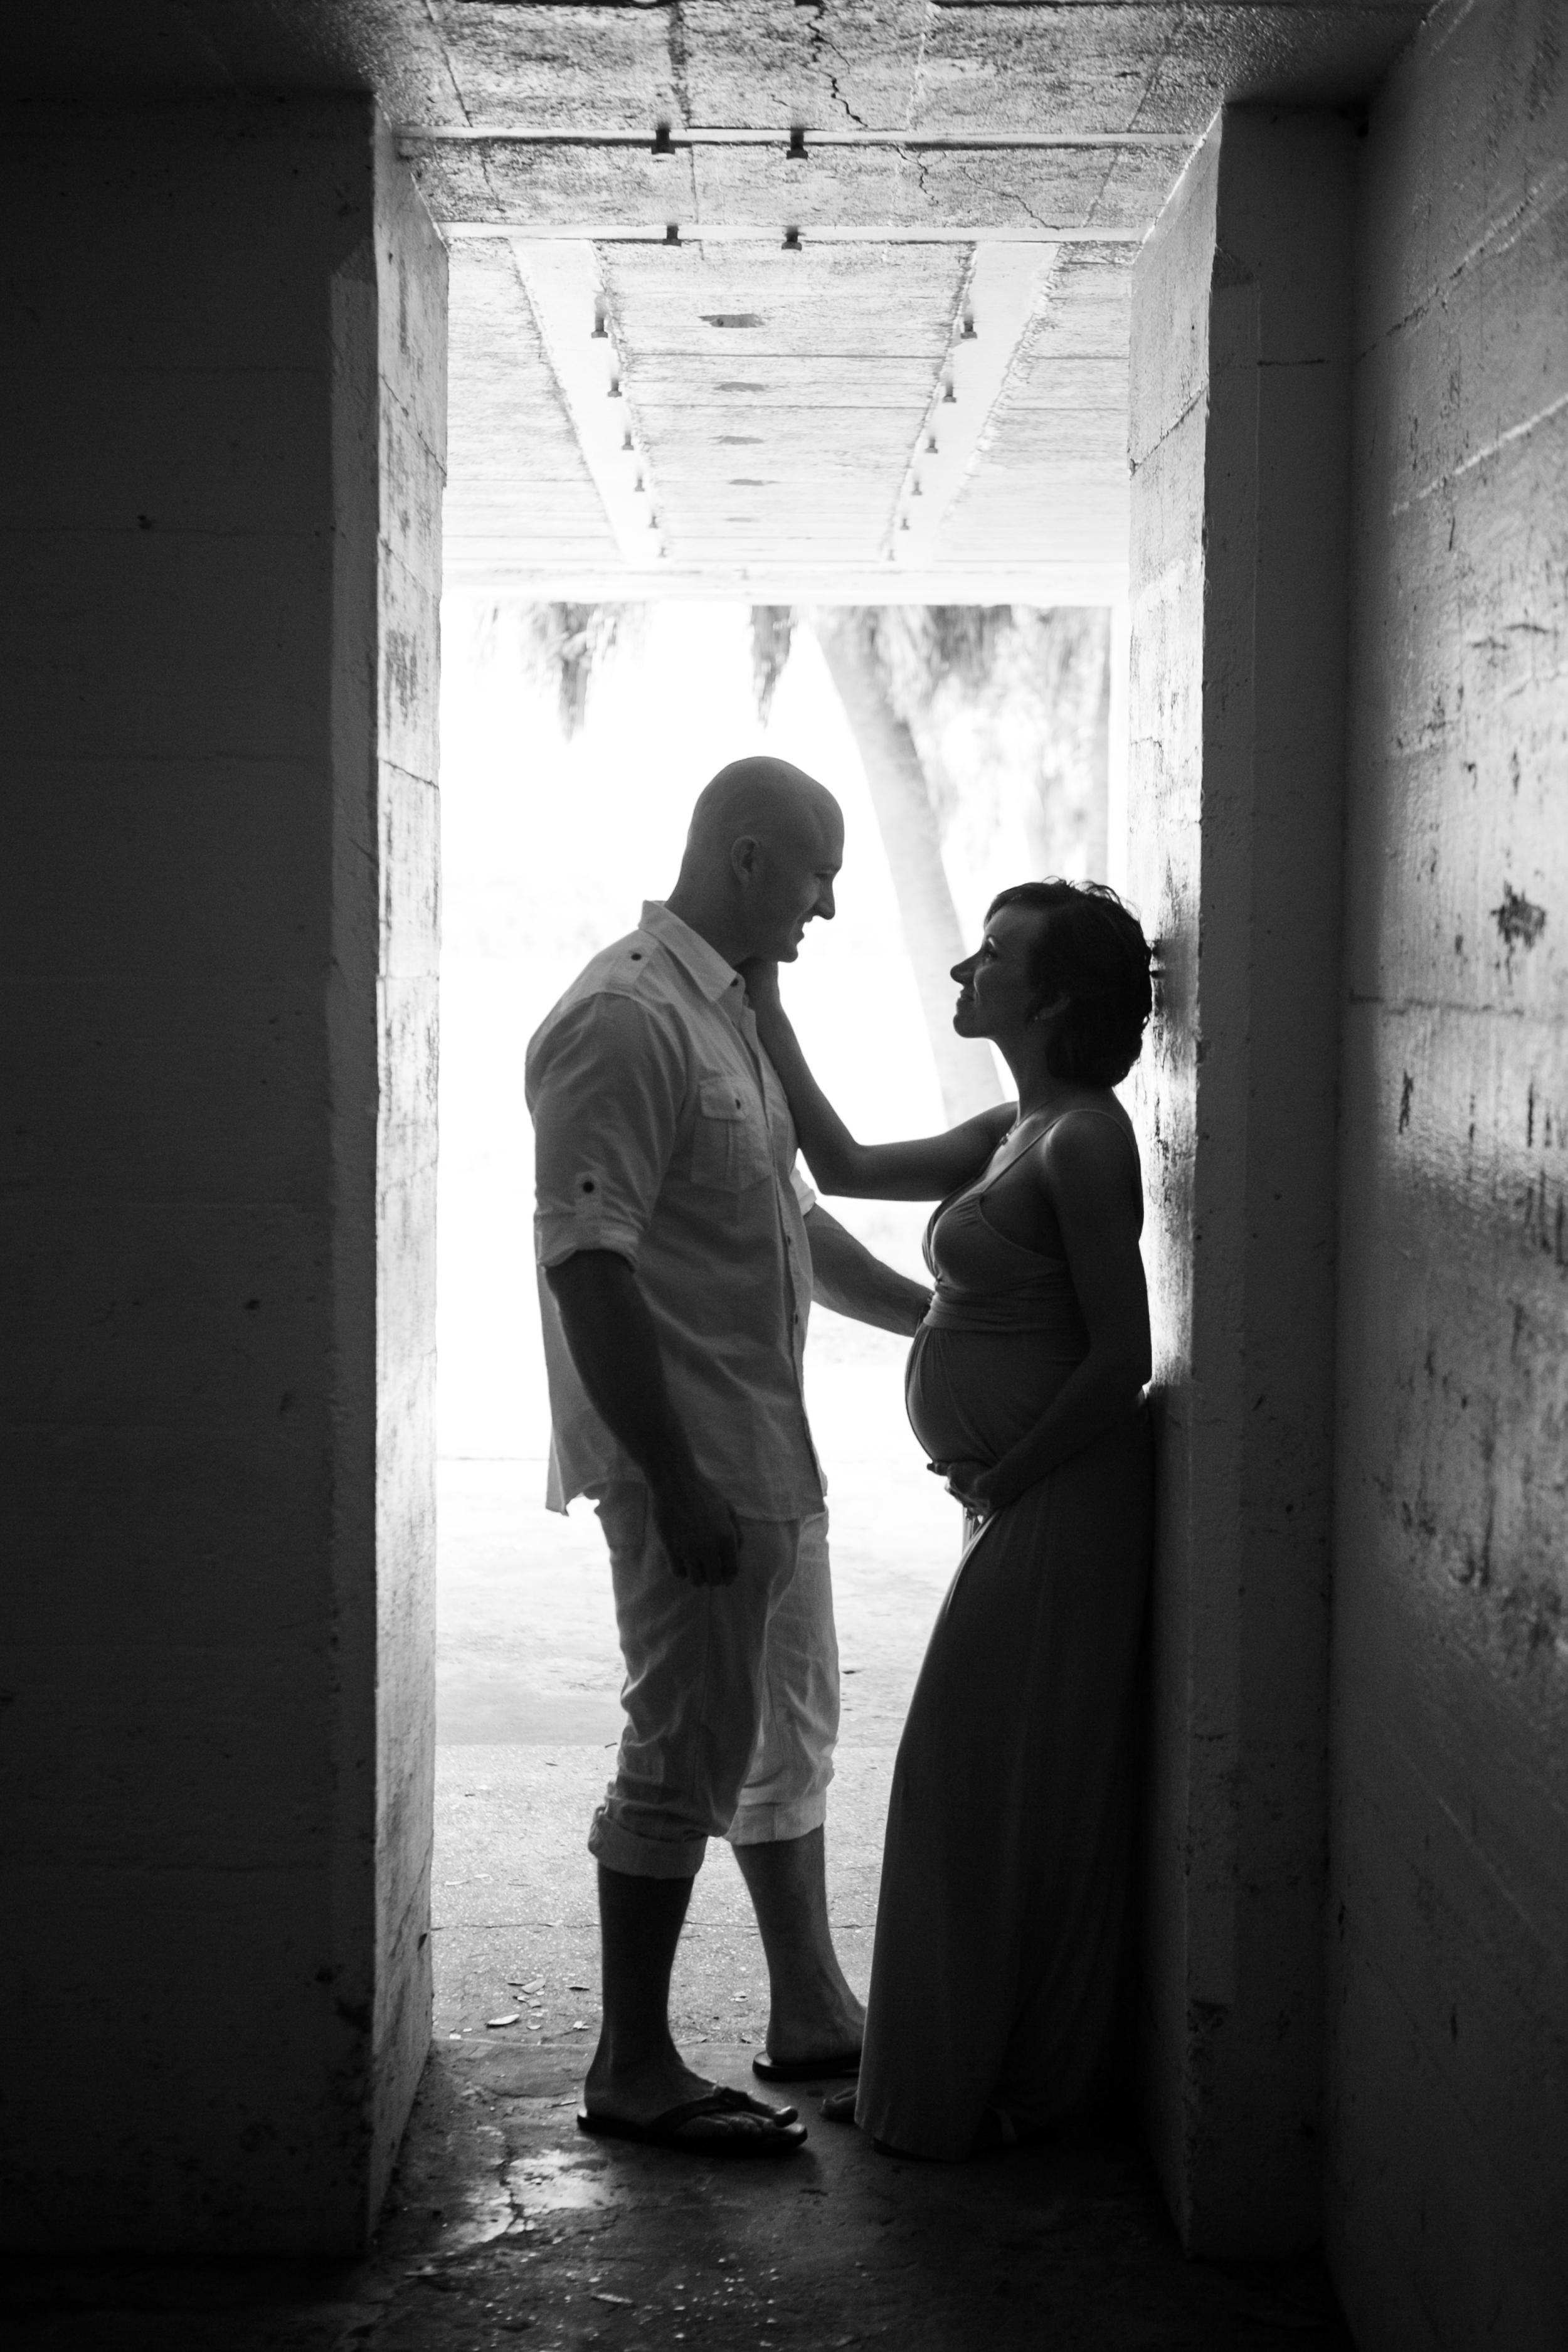 7_16_16 Katie and Zach Fort Desoto Maternity Portraits 01.jpg